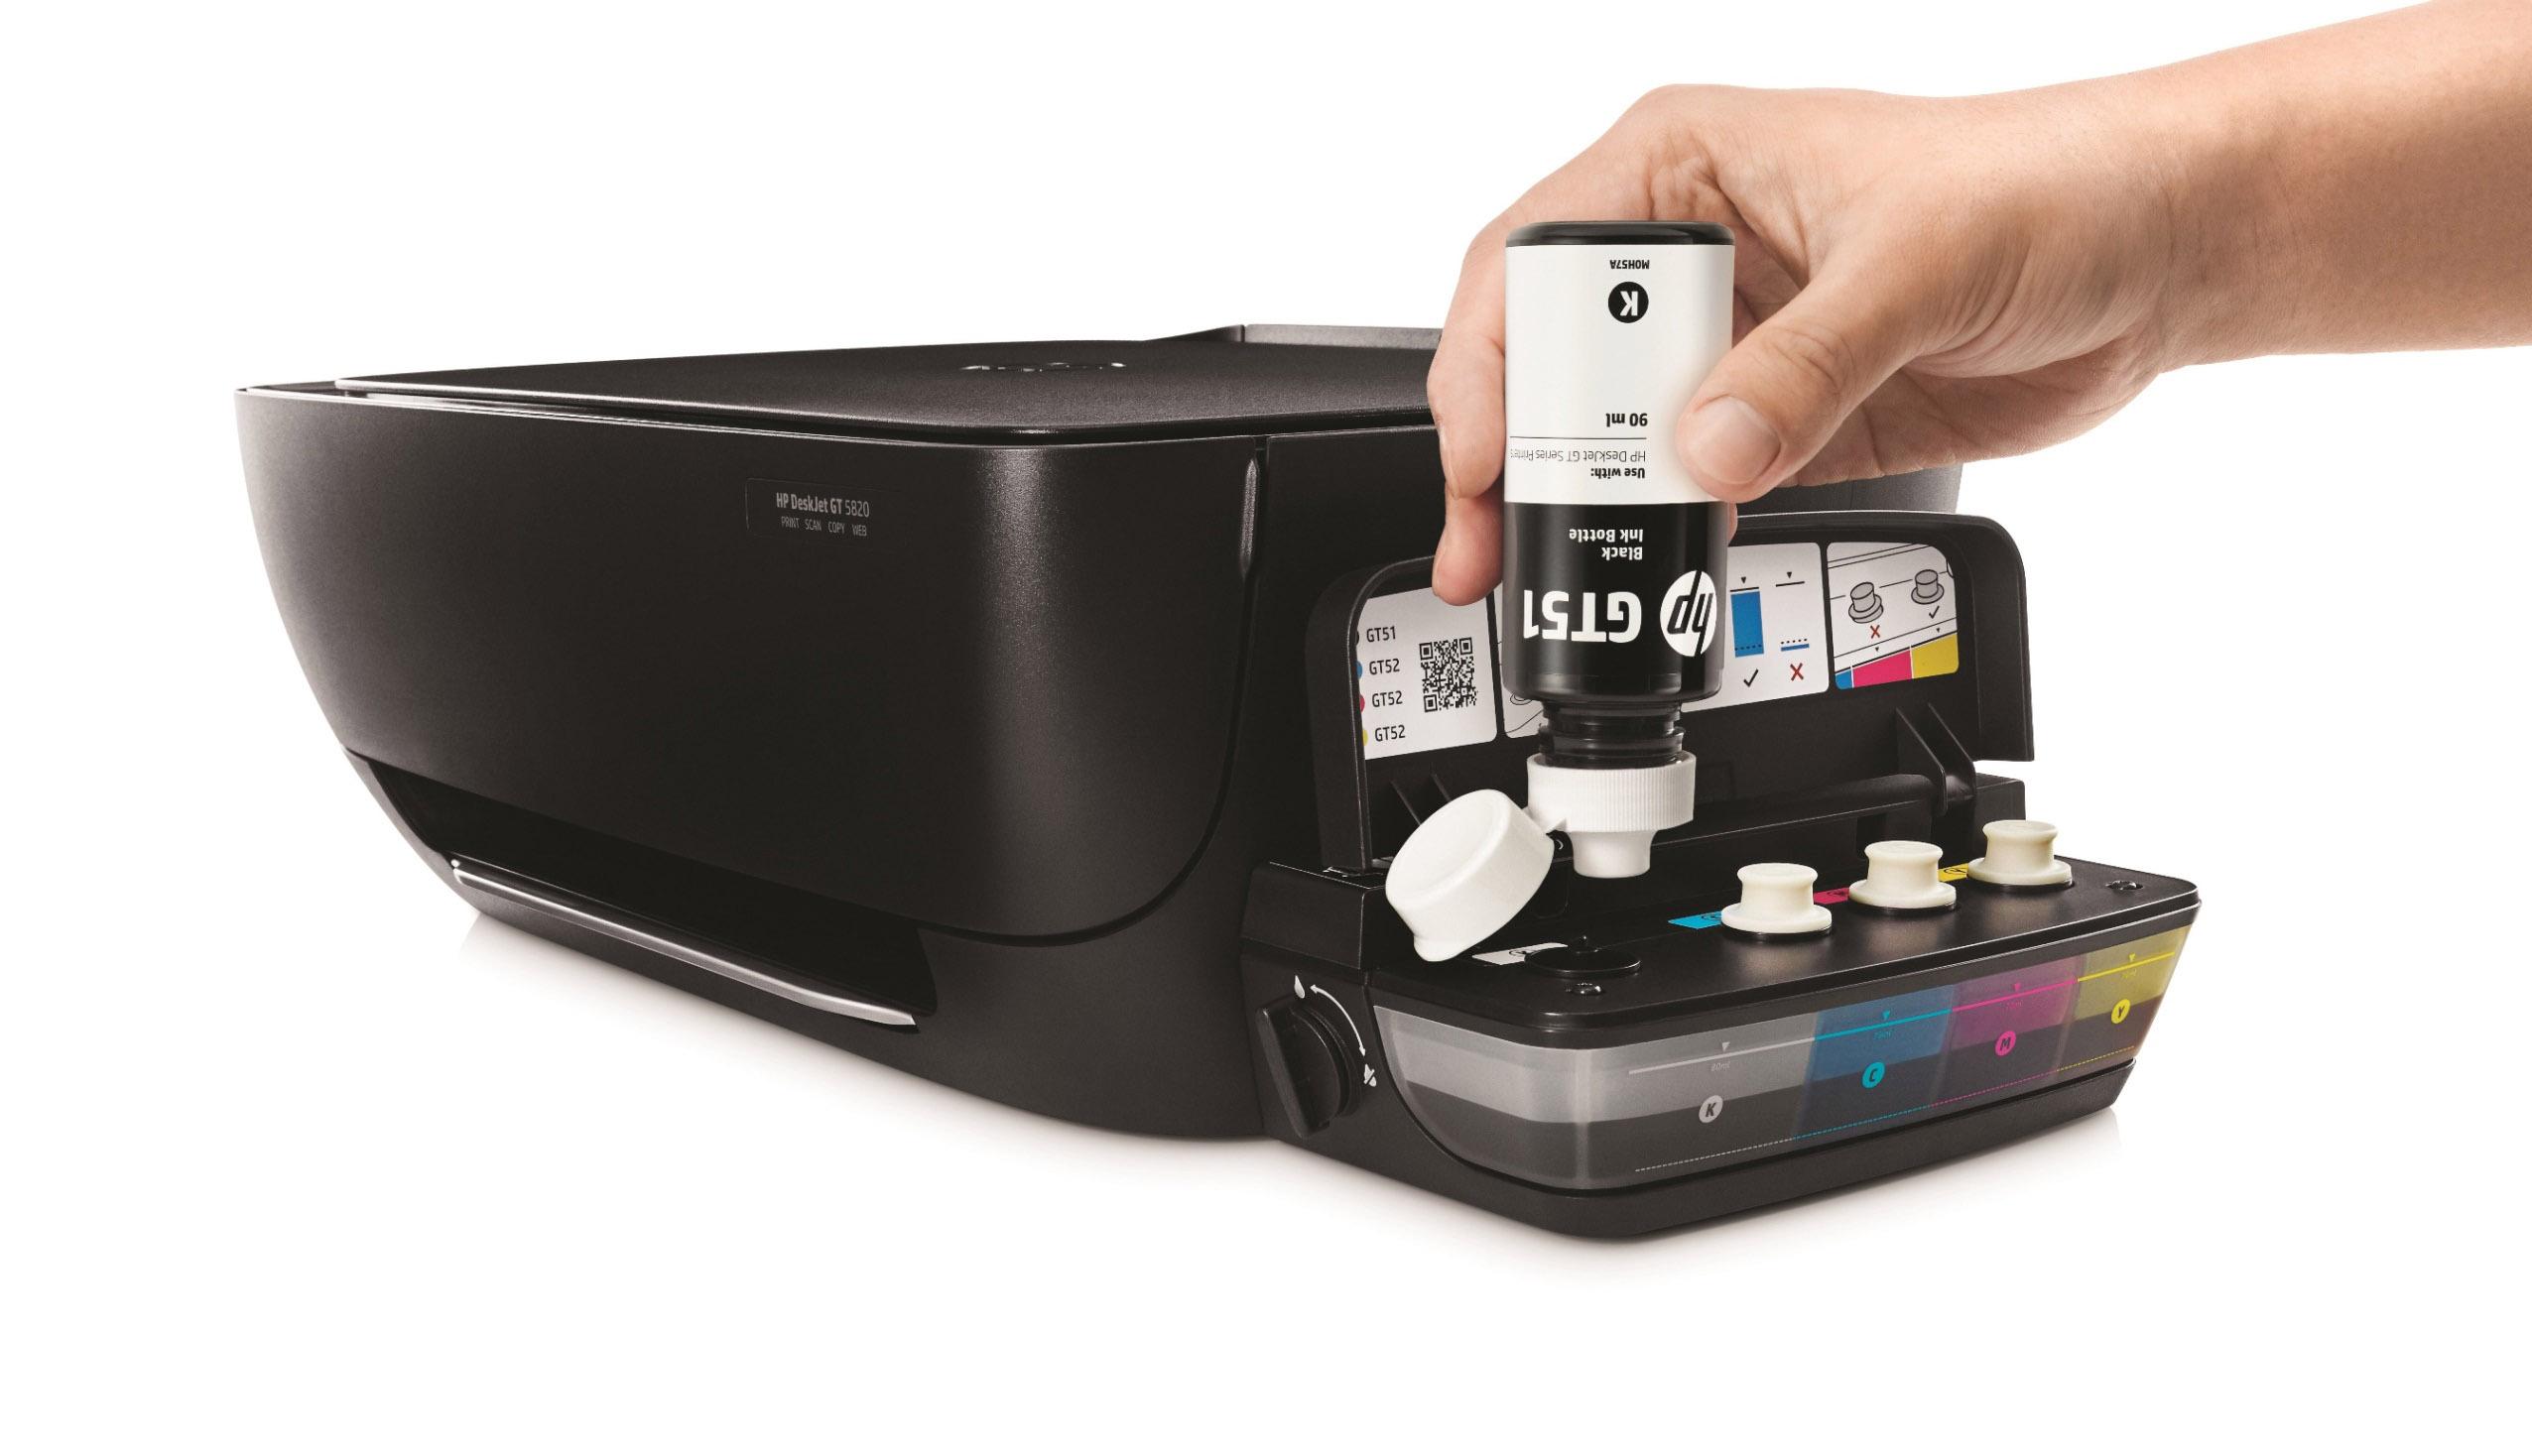 HP DeskJet GT Series Ink Bottles (Black), In use refilling printer